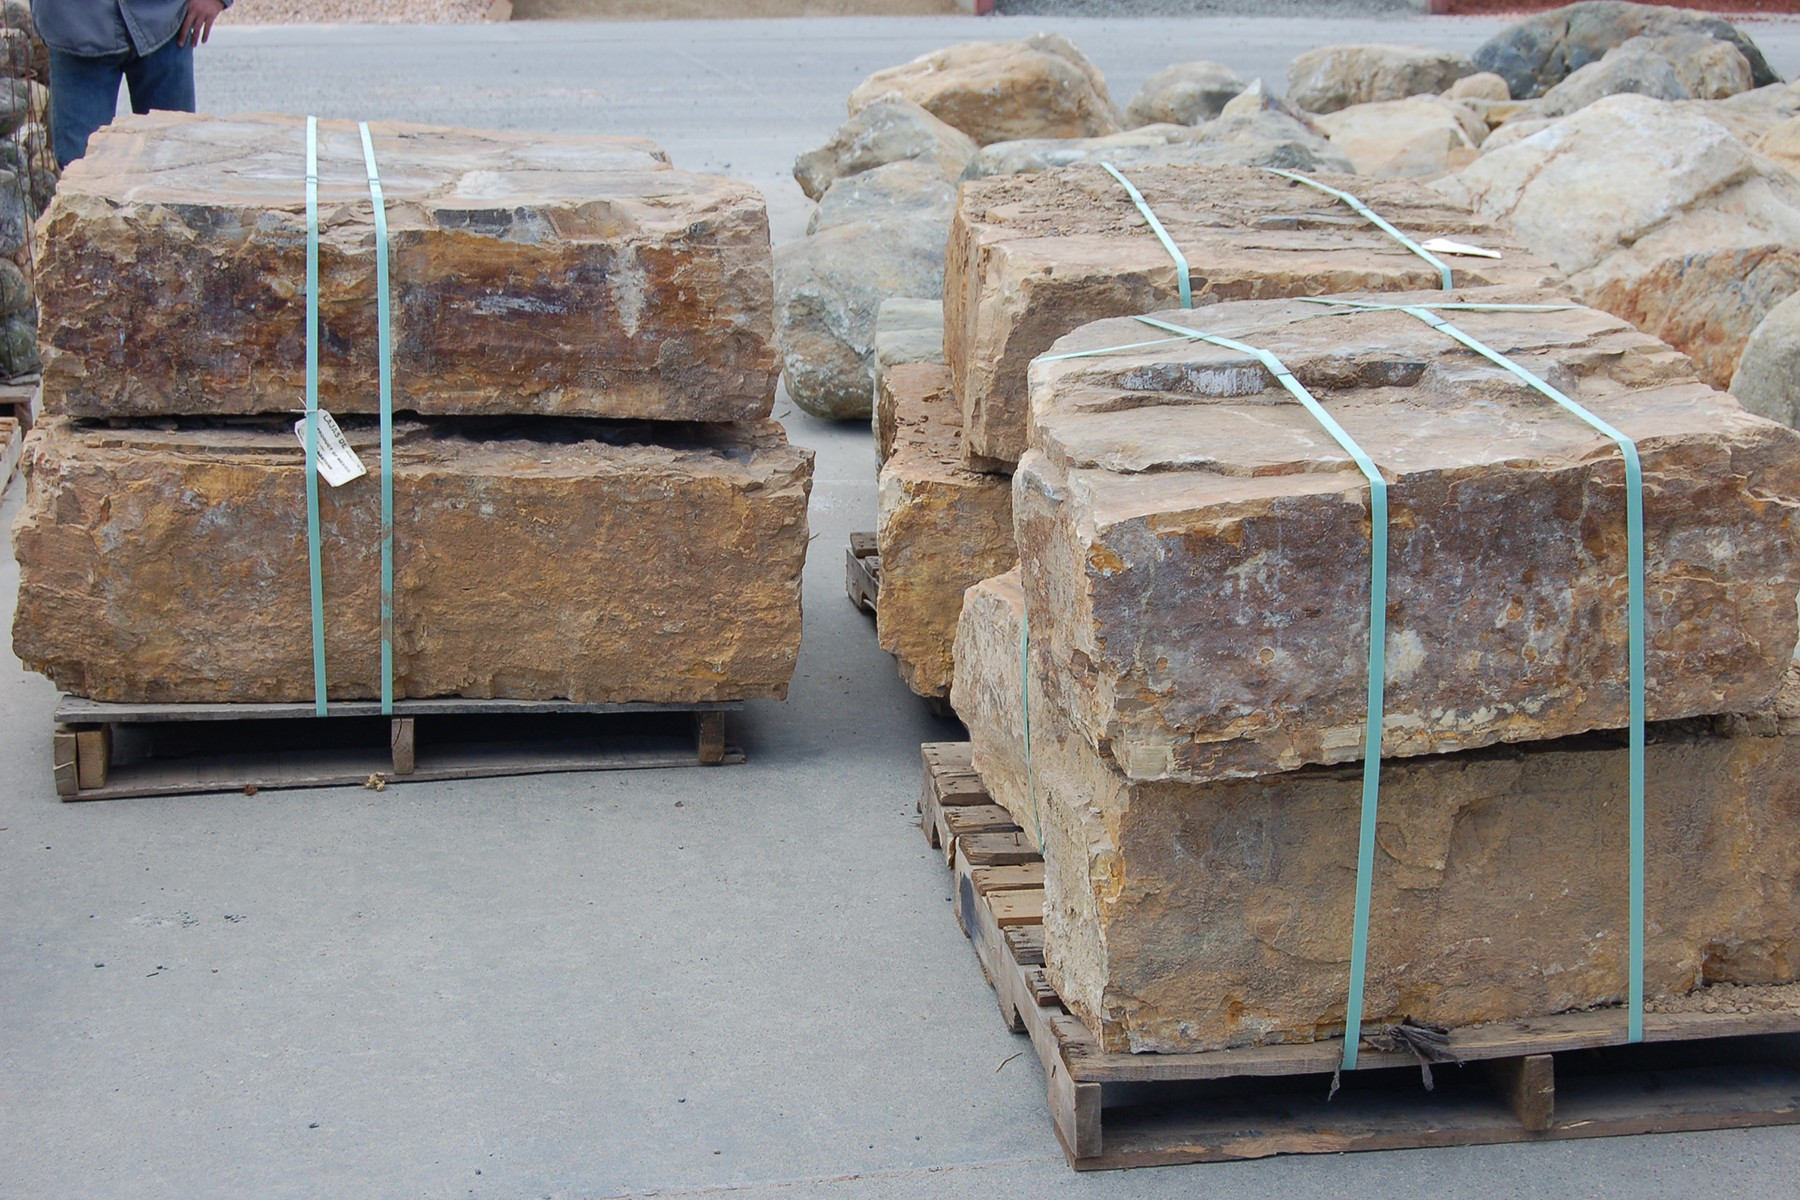 Sonoran Gold Boulders